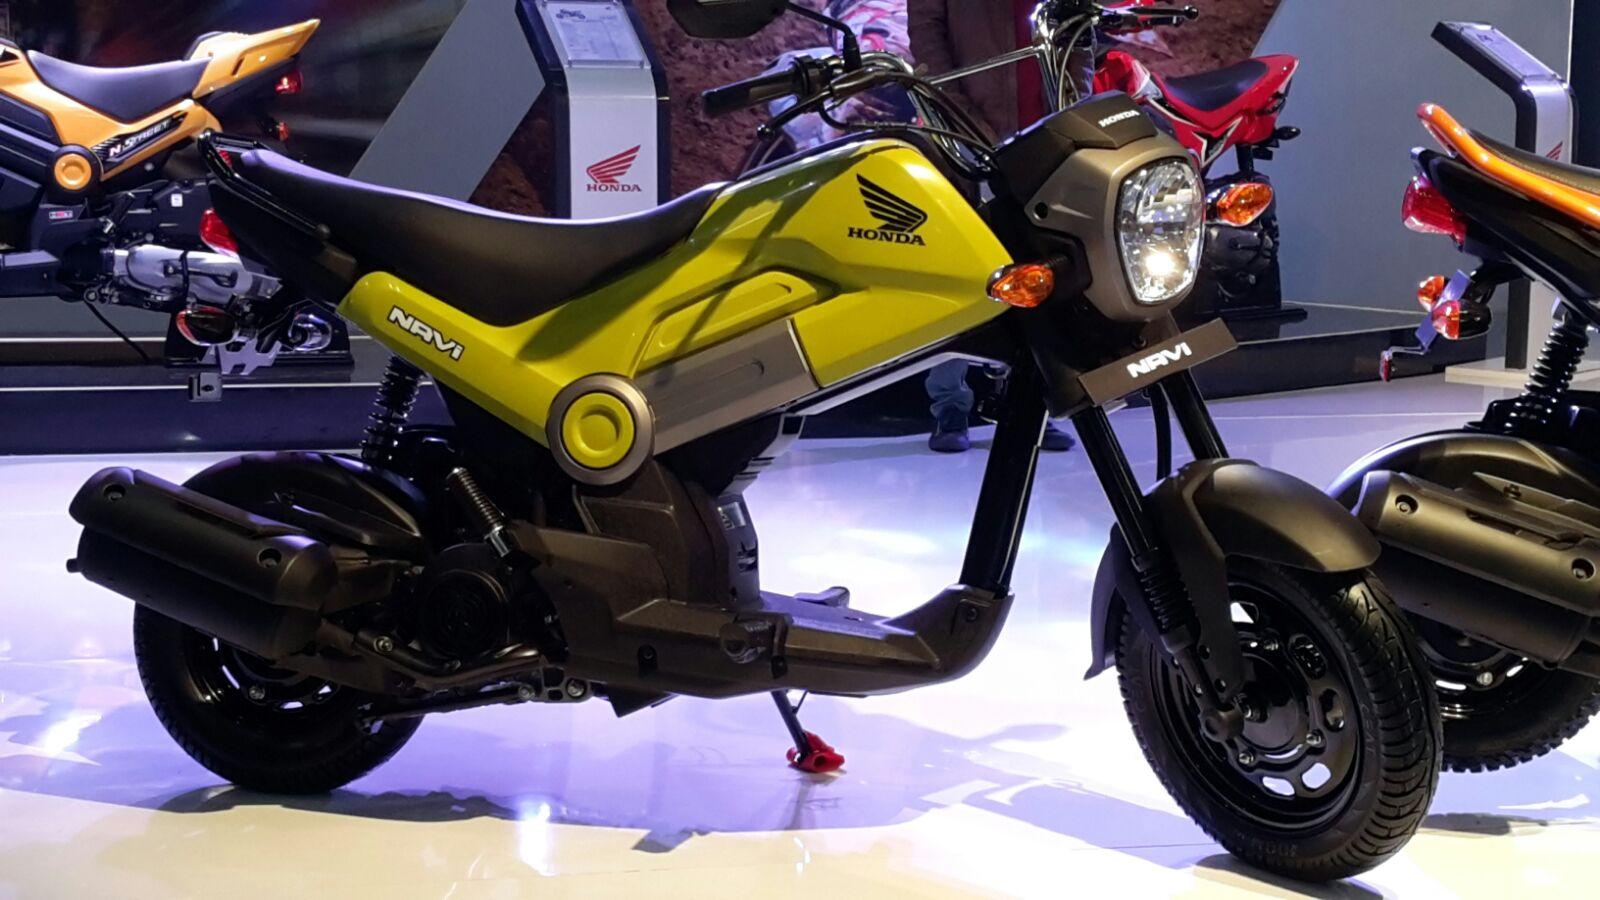 Auto Expo 2016 Launches Updates News Images: Honda Bikes At Auto Expo 2016, Honda Bikes In Delhi Auto Expo